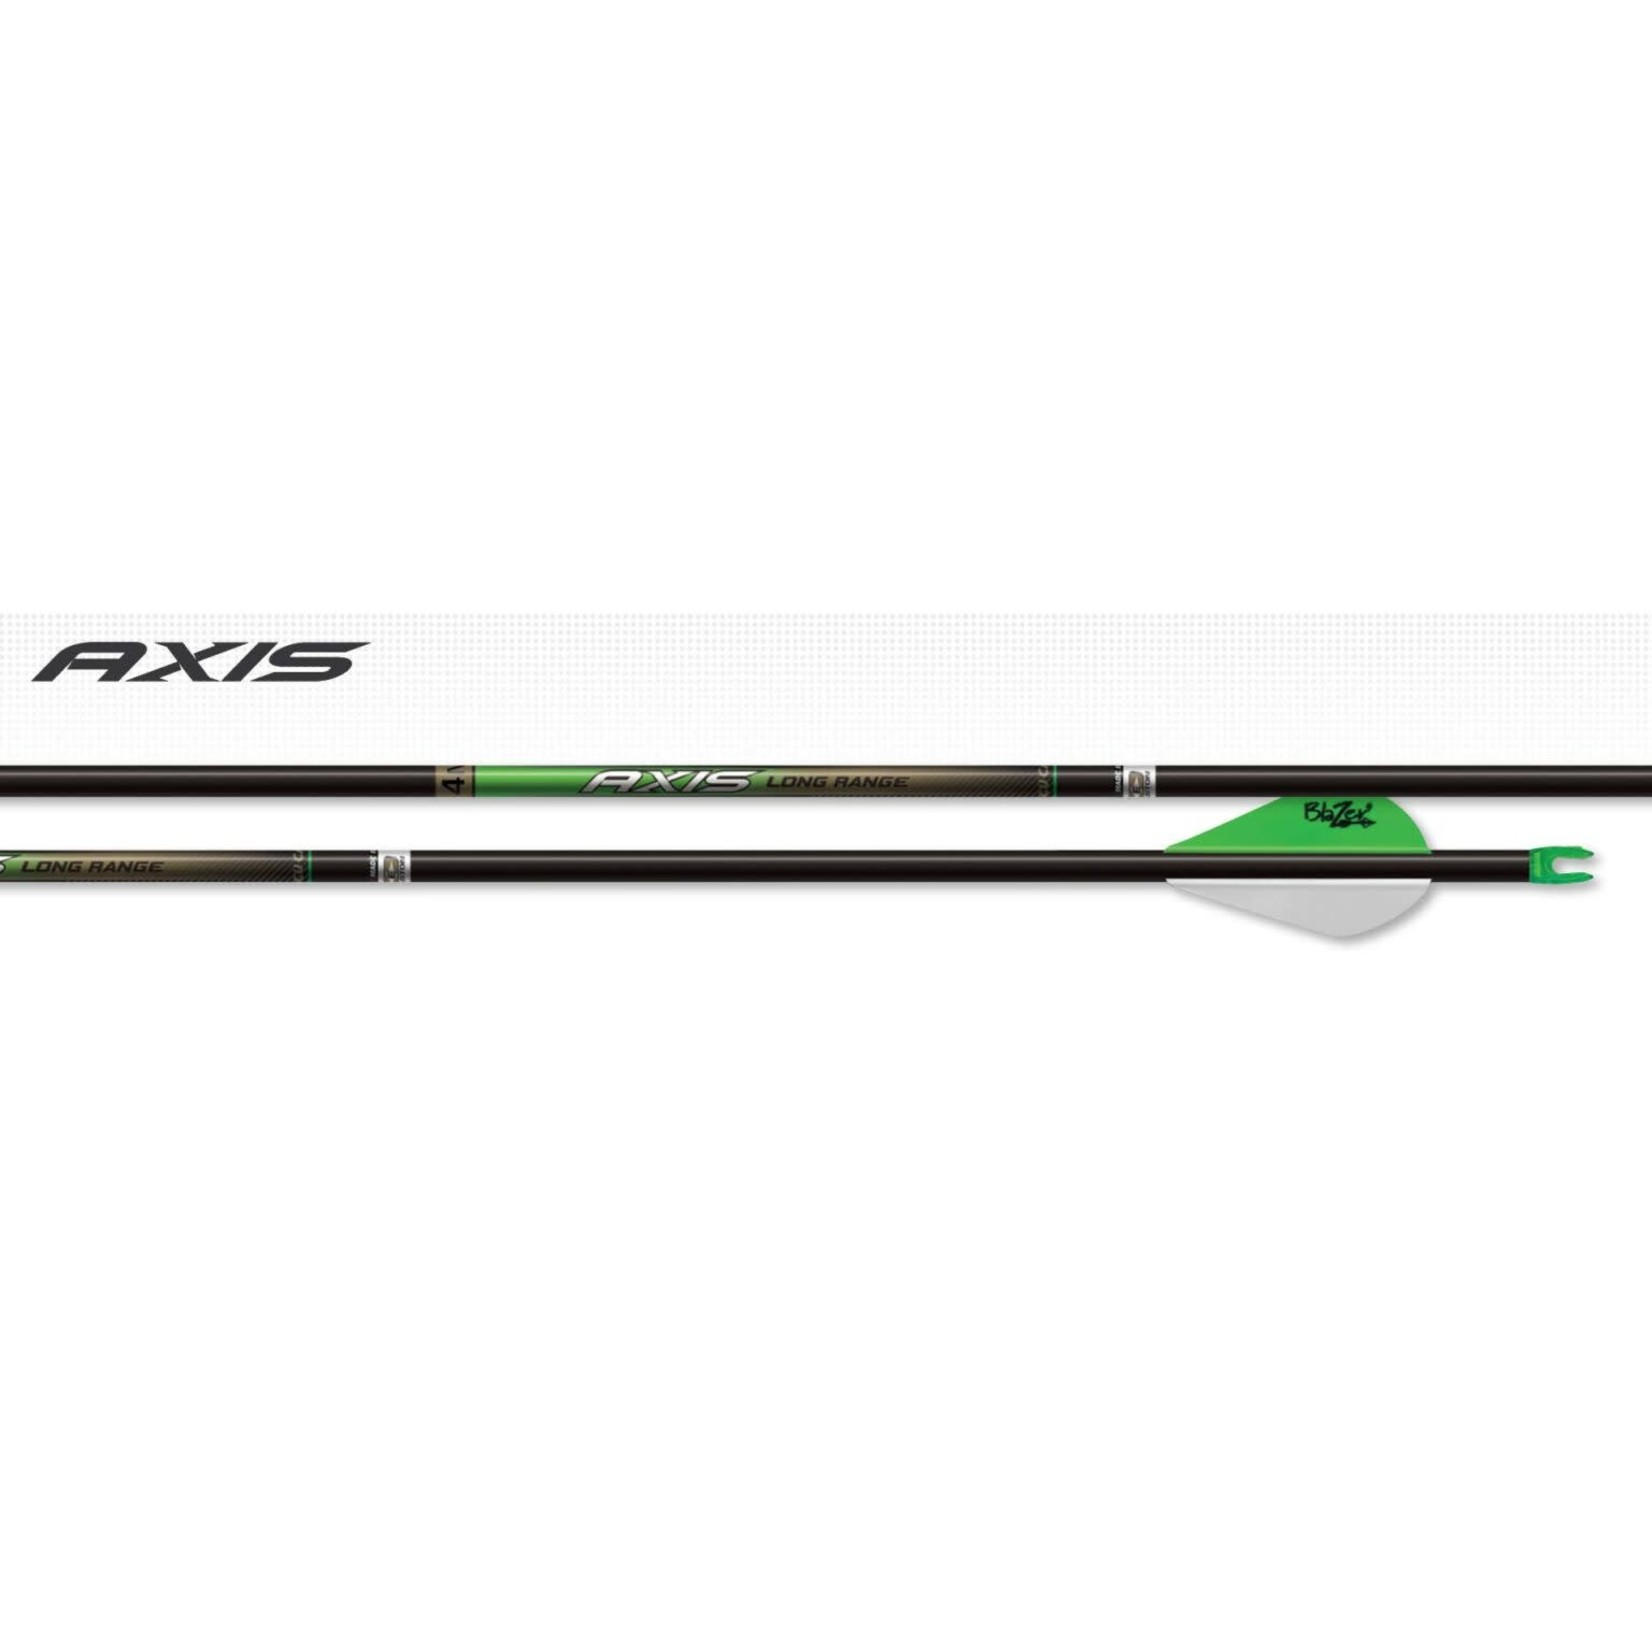 Easton Easton Axis Long Range 4mm Arrow Shafts 400 (1/2 doz)